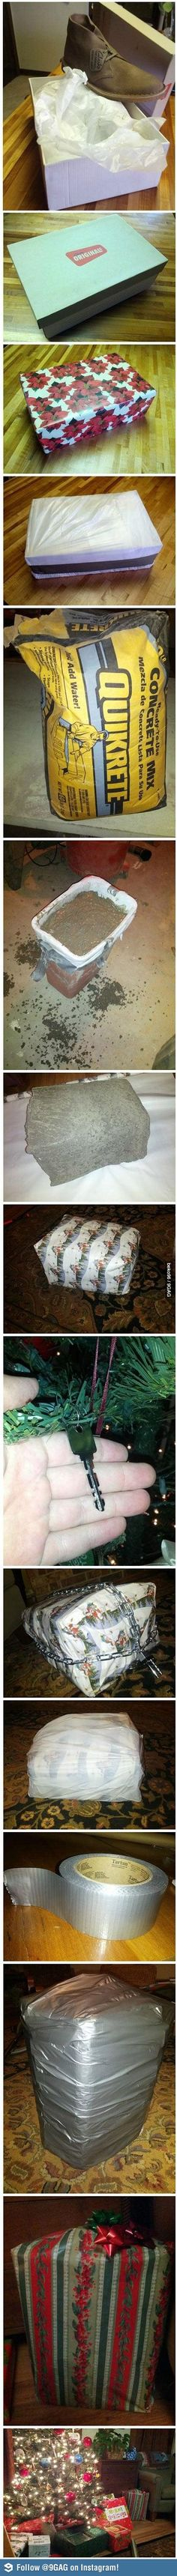 next year for my boyfriend's gifts :>